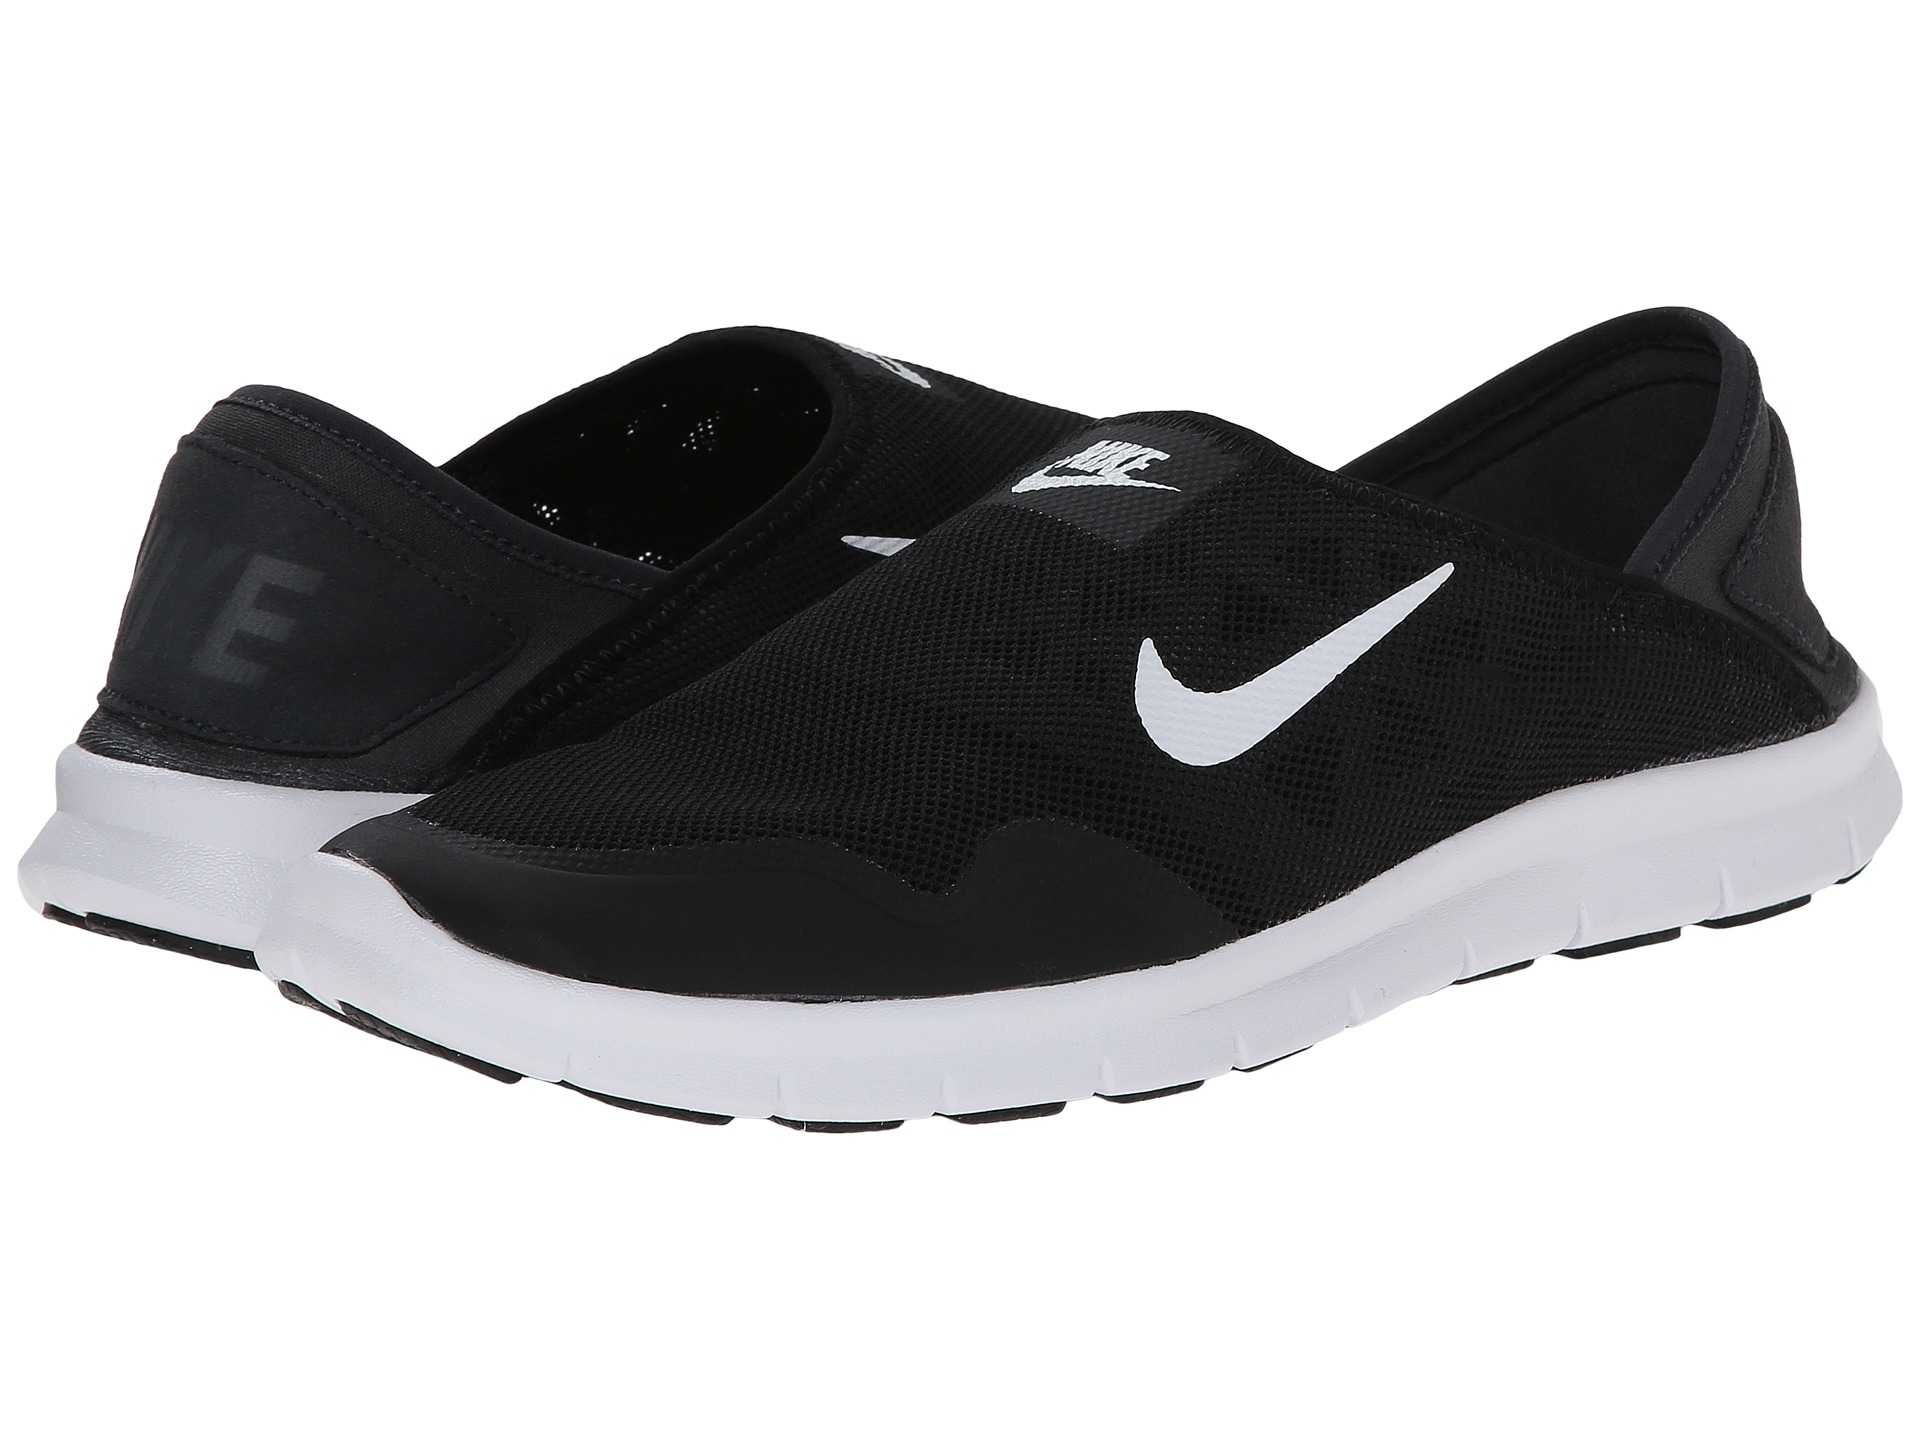 31758758f8b870 Lyst - Nike Orive Lite Slip-on in Black